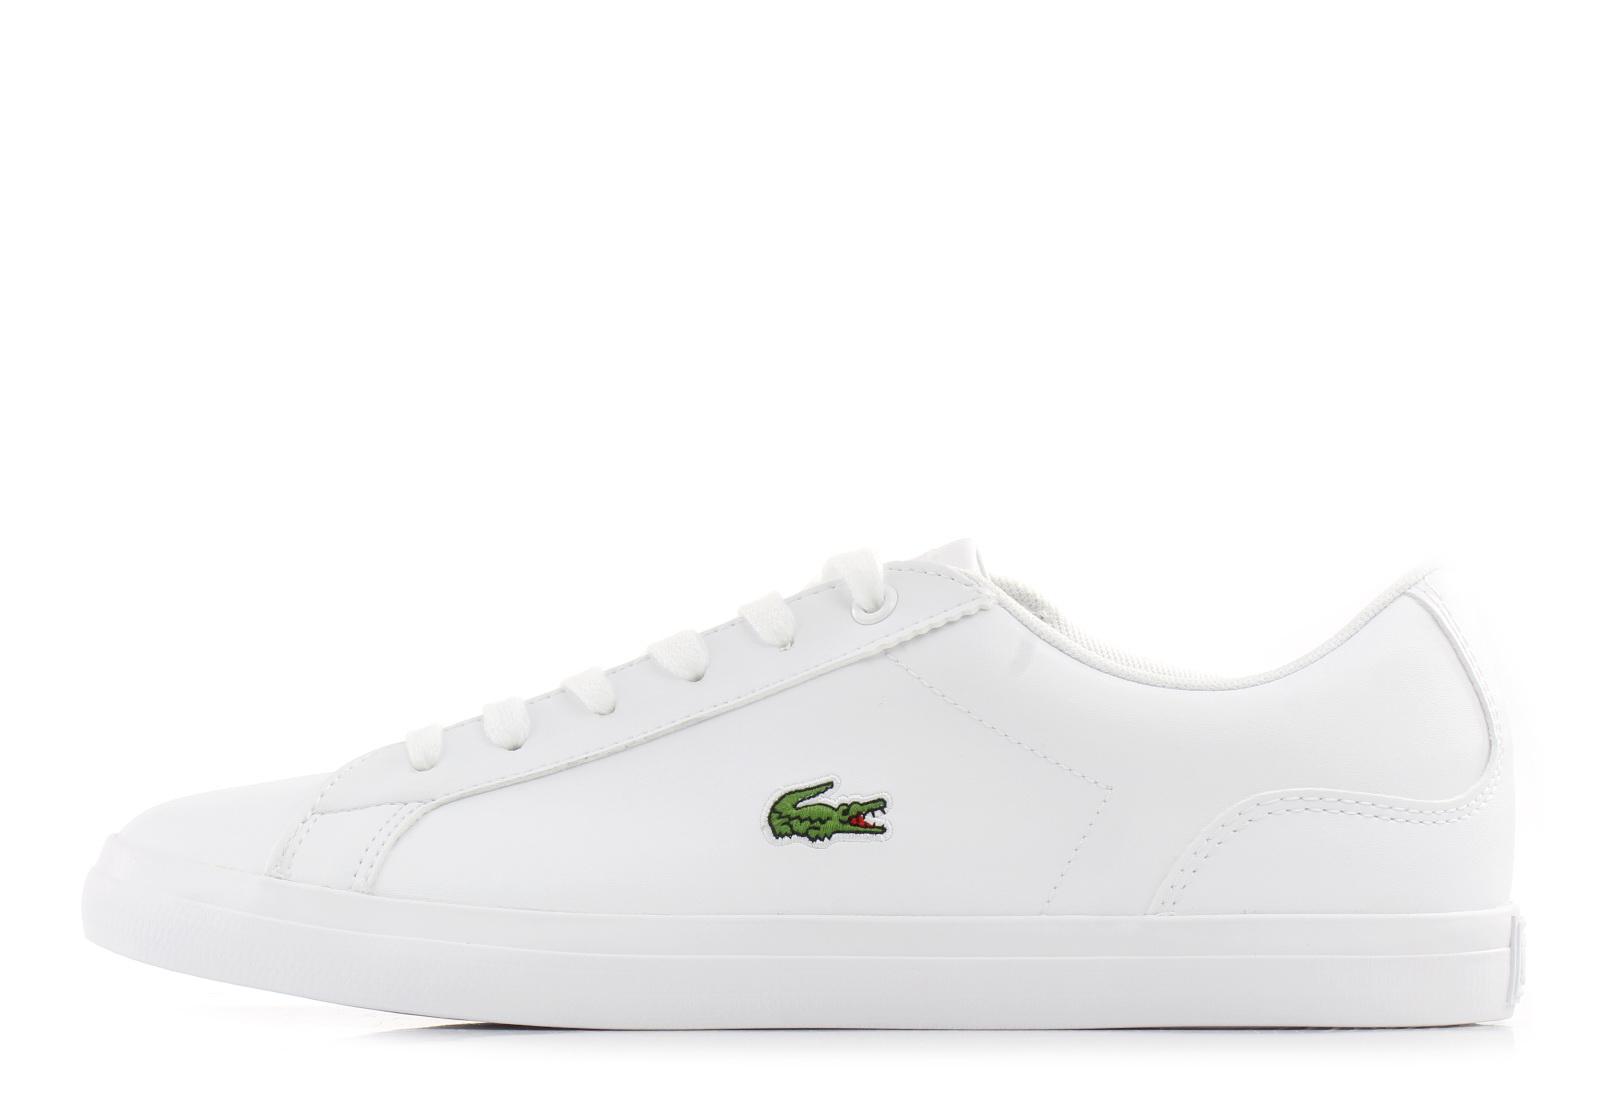 Lacoste Cipő - Lerond - 191CUJ0015-21G - Office Shoes Magyarország 0687b66553